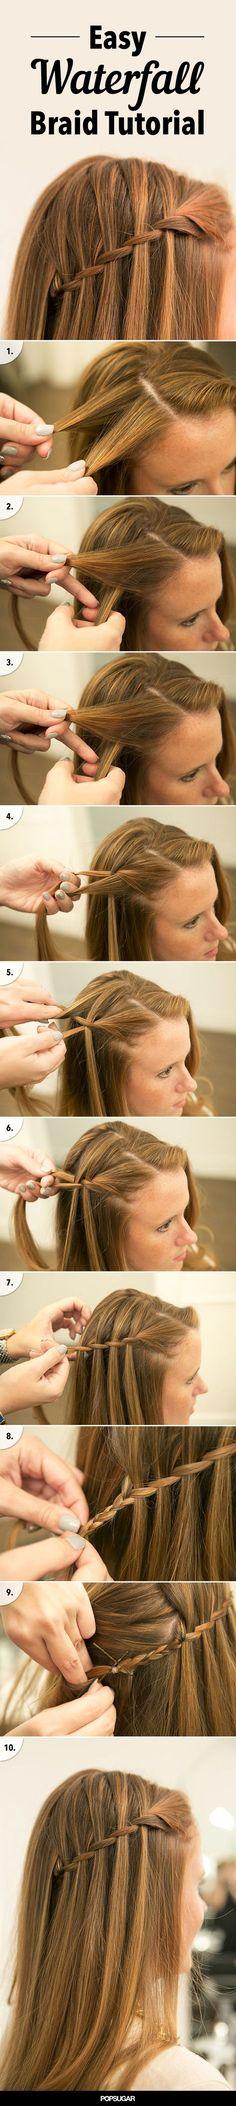 How to #DIY a waterfall braid. #waterfallbraid #braid